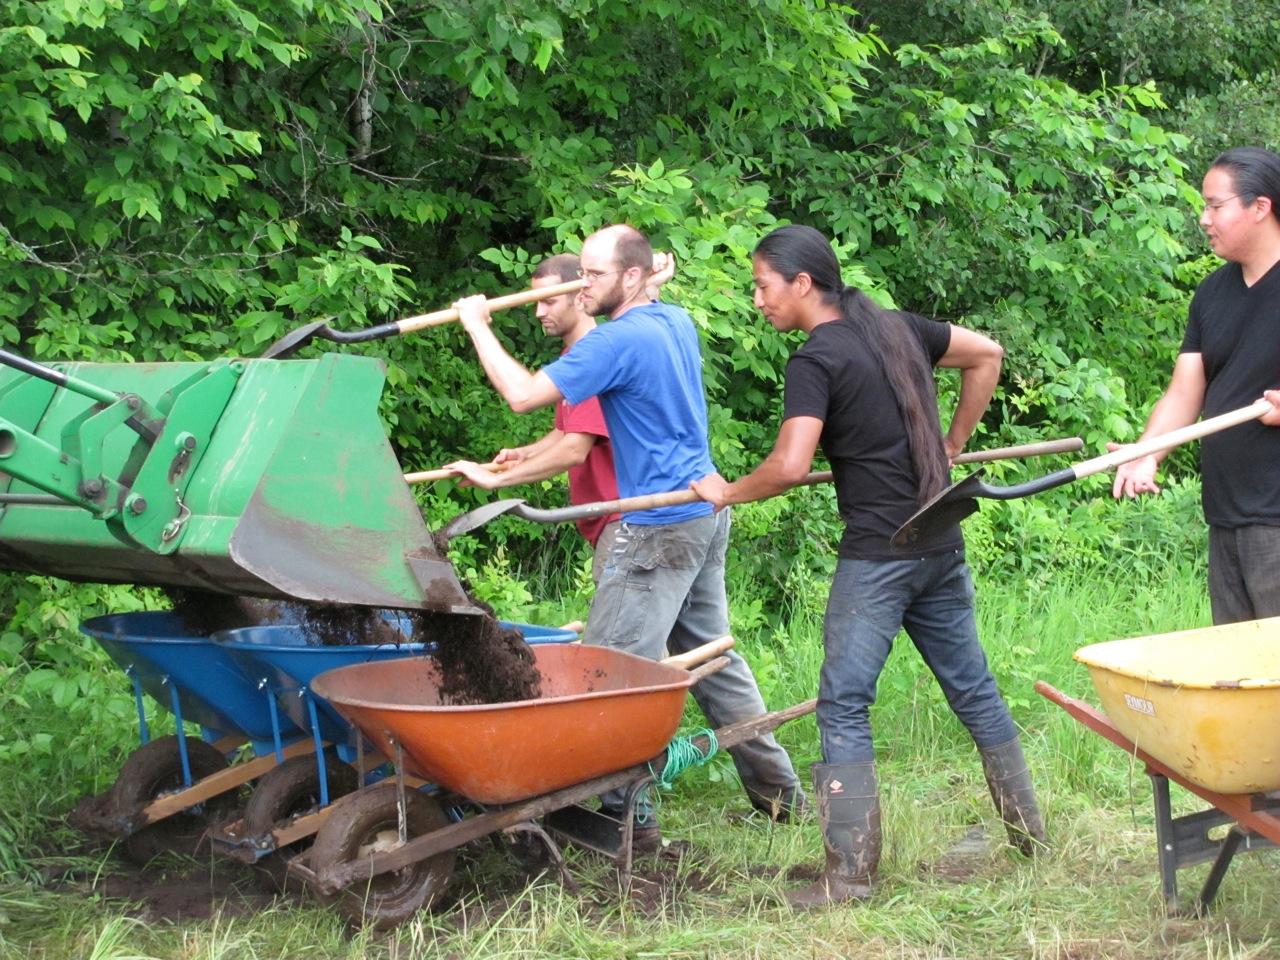 unloading compost.jpg